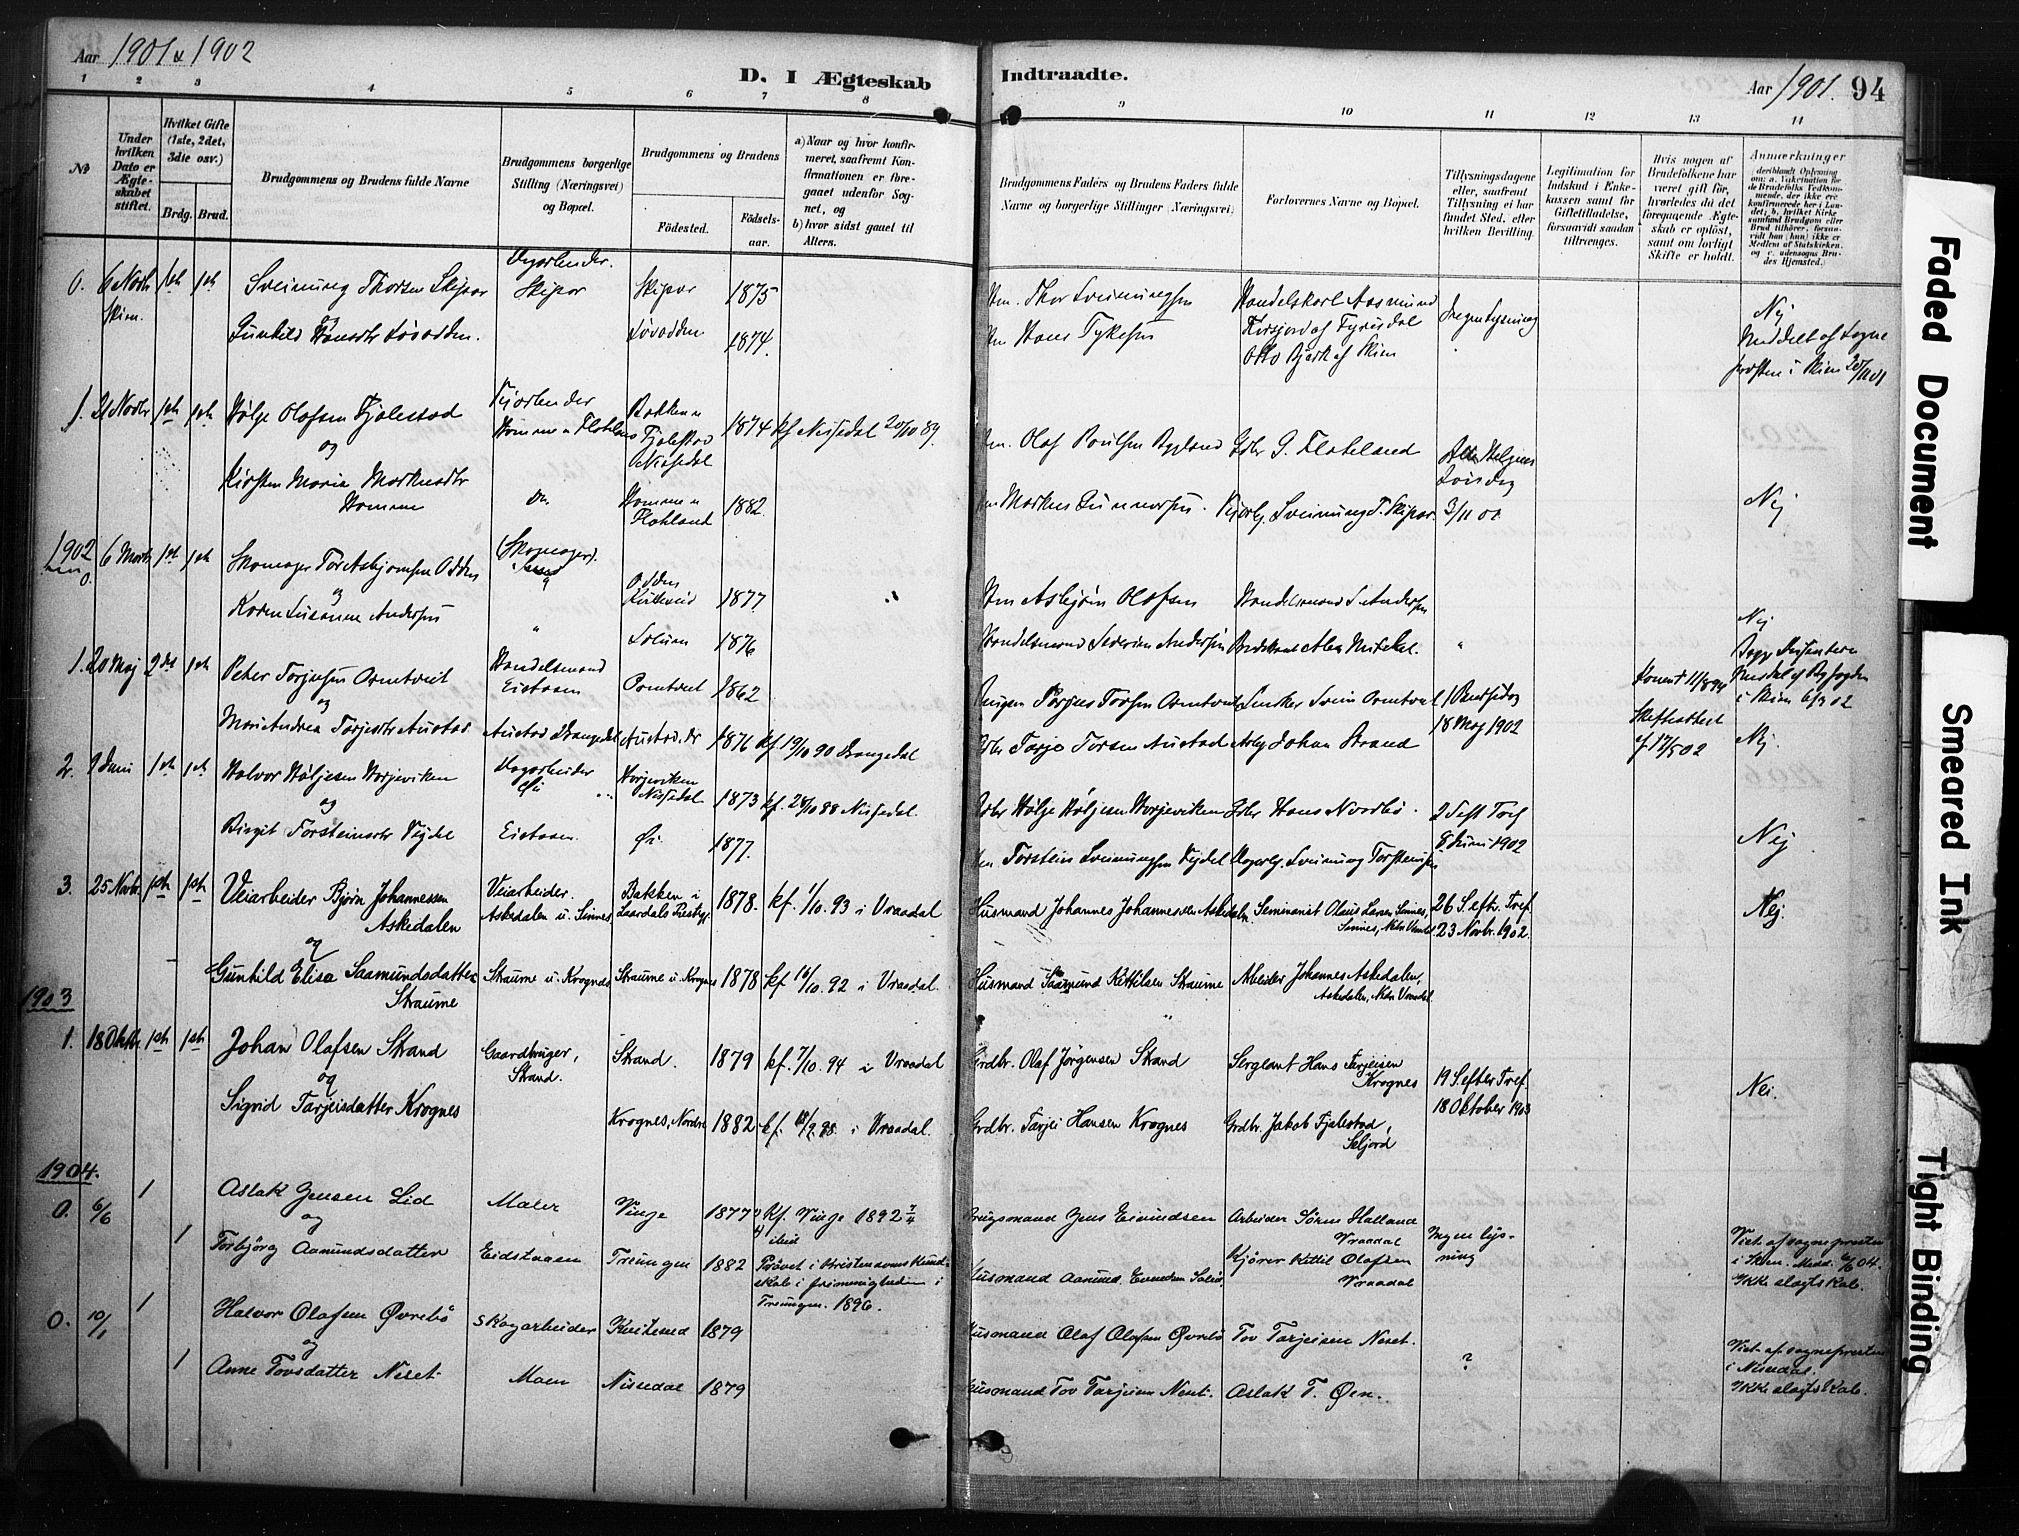 SAKO, Kviteseid kirkebøker, F/Fc/L0002: Ministerialbok nr. III 2, 1882-1908, s. 94